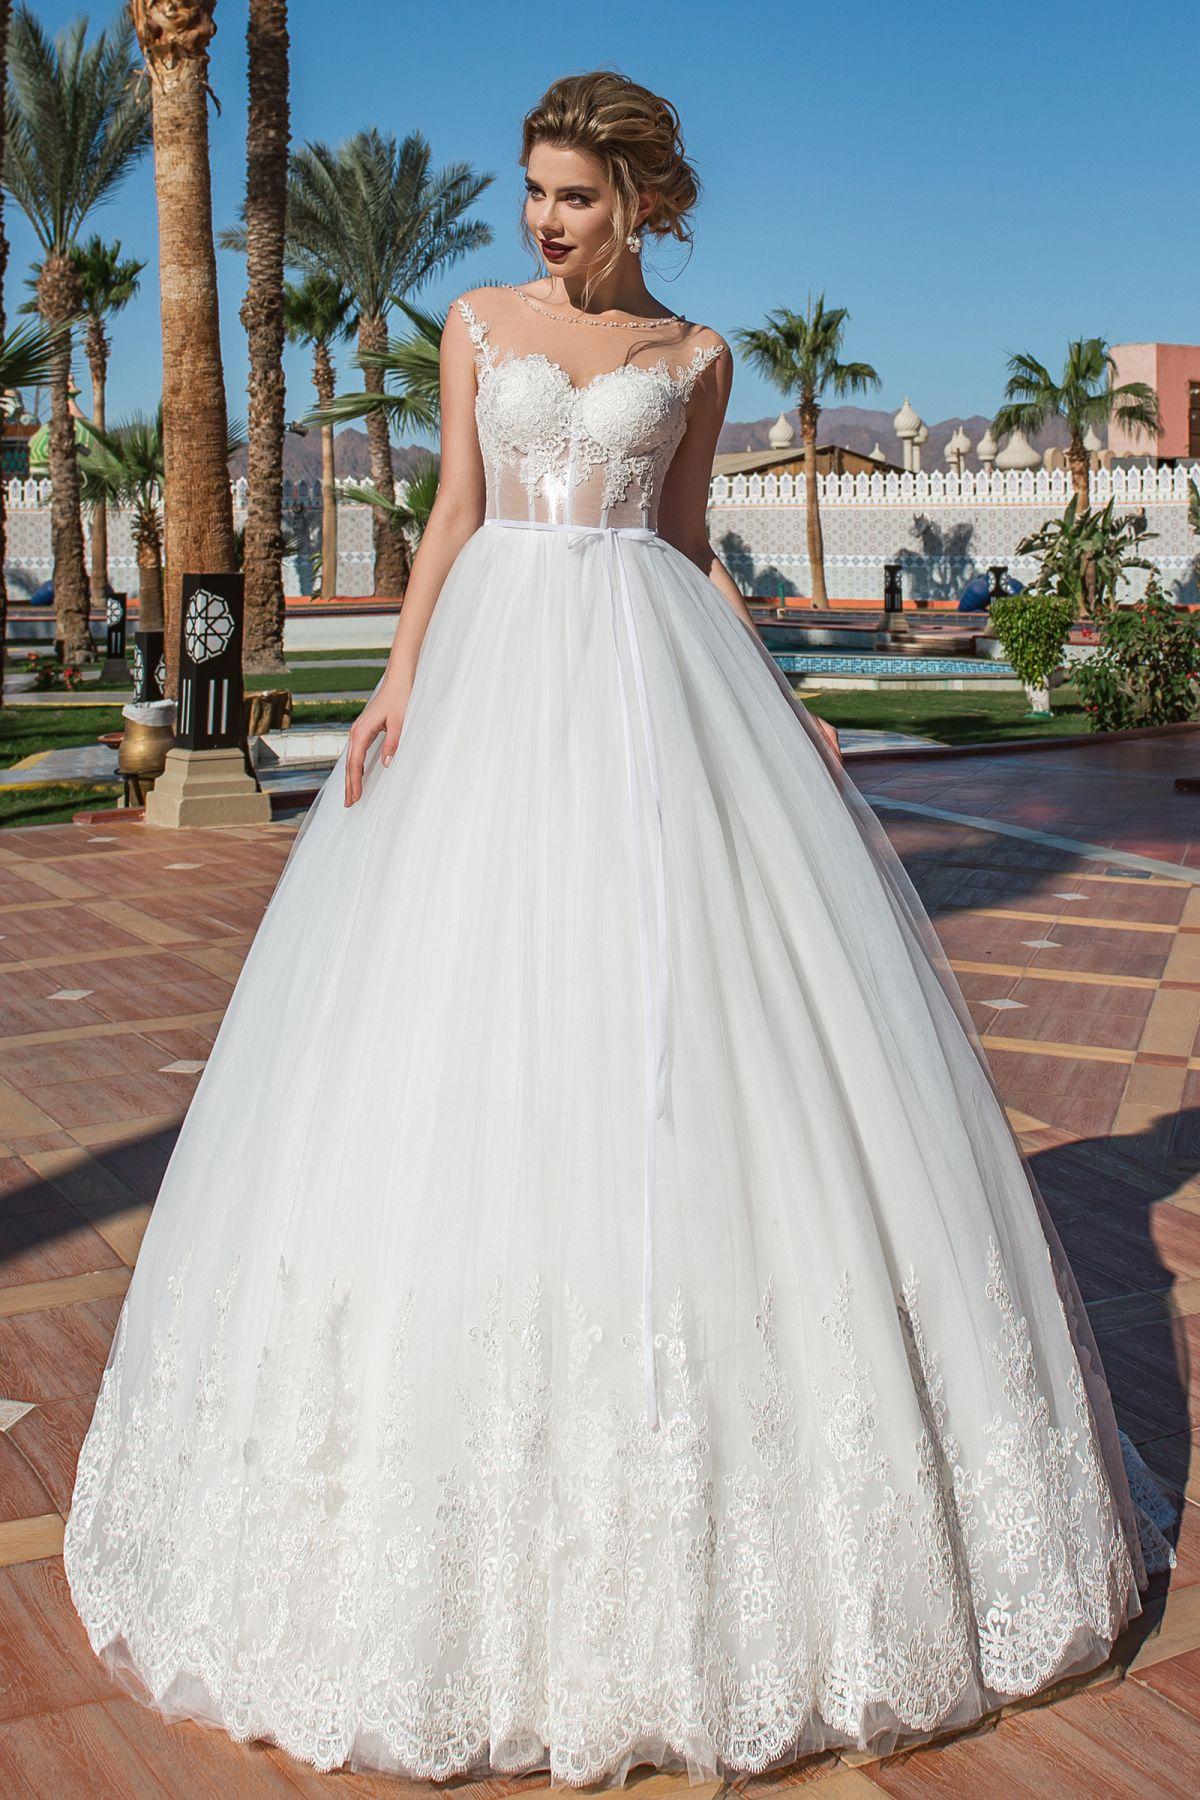 010aa66cb8a5 Νυφικό «Allison» - Νυφικά Θρησκευτικού Γάμου